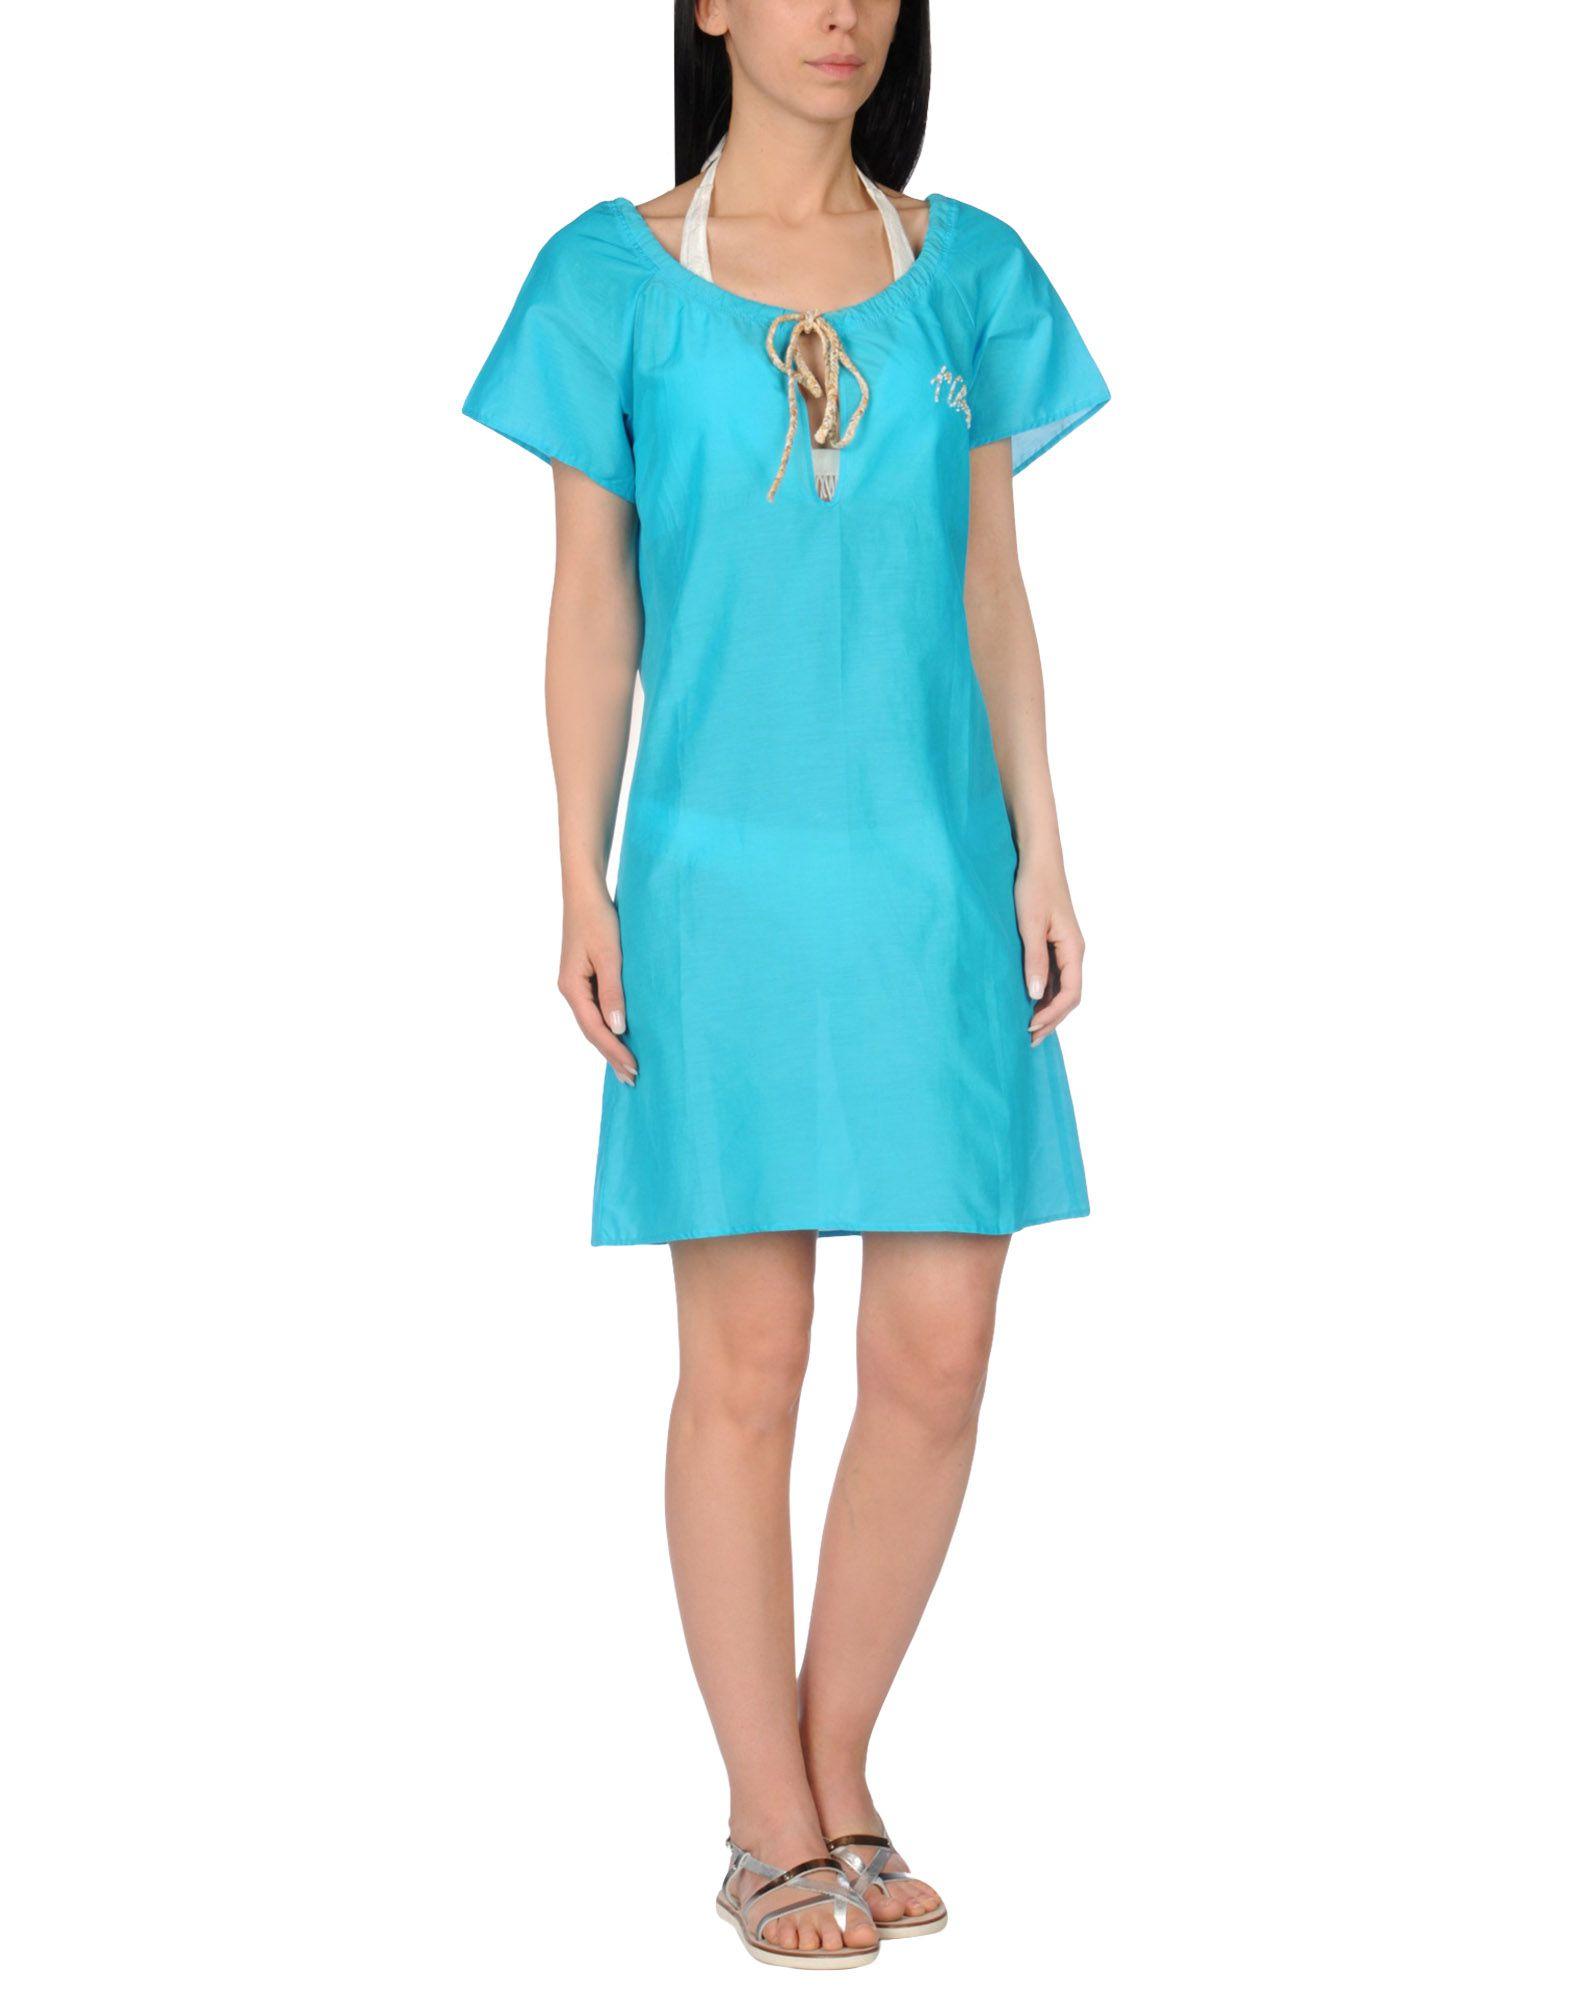 ALVIERO MARTINI 1a CLASSE BEACHSTYLE Пляжное платье alviero martini 1a classe beachstyle толстовка